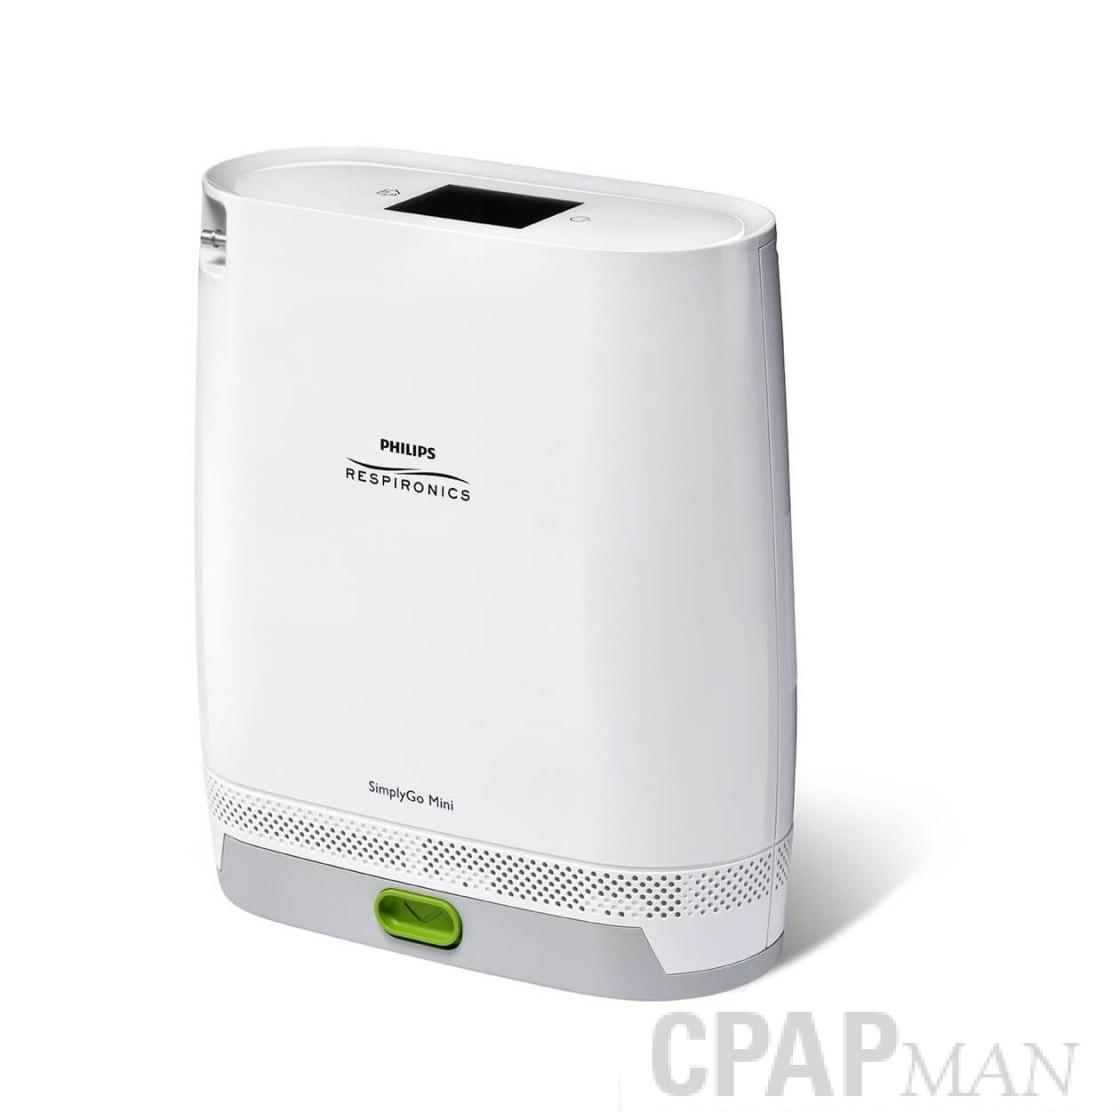 SimplyGo Mini Oxygen Concentrator